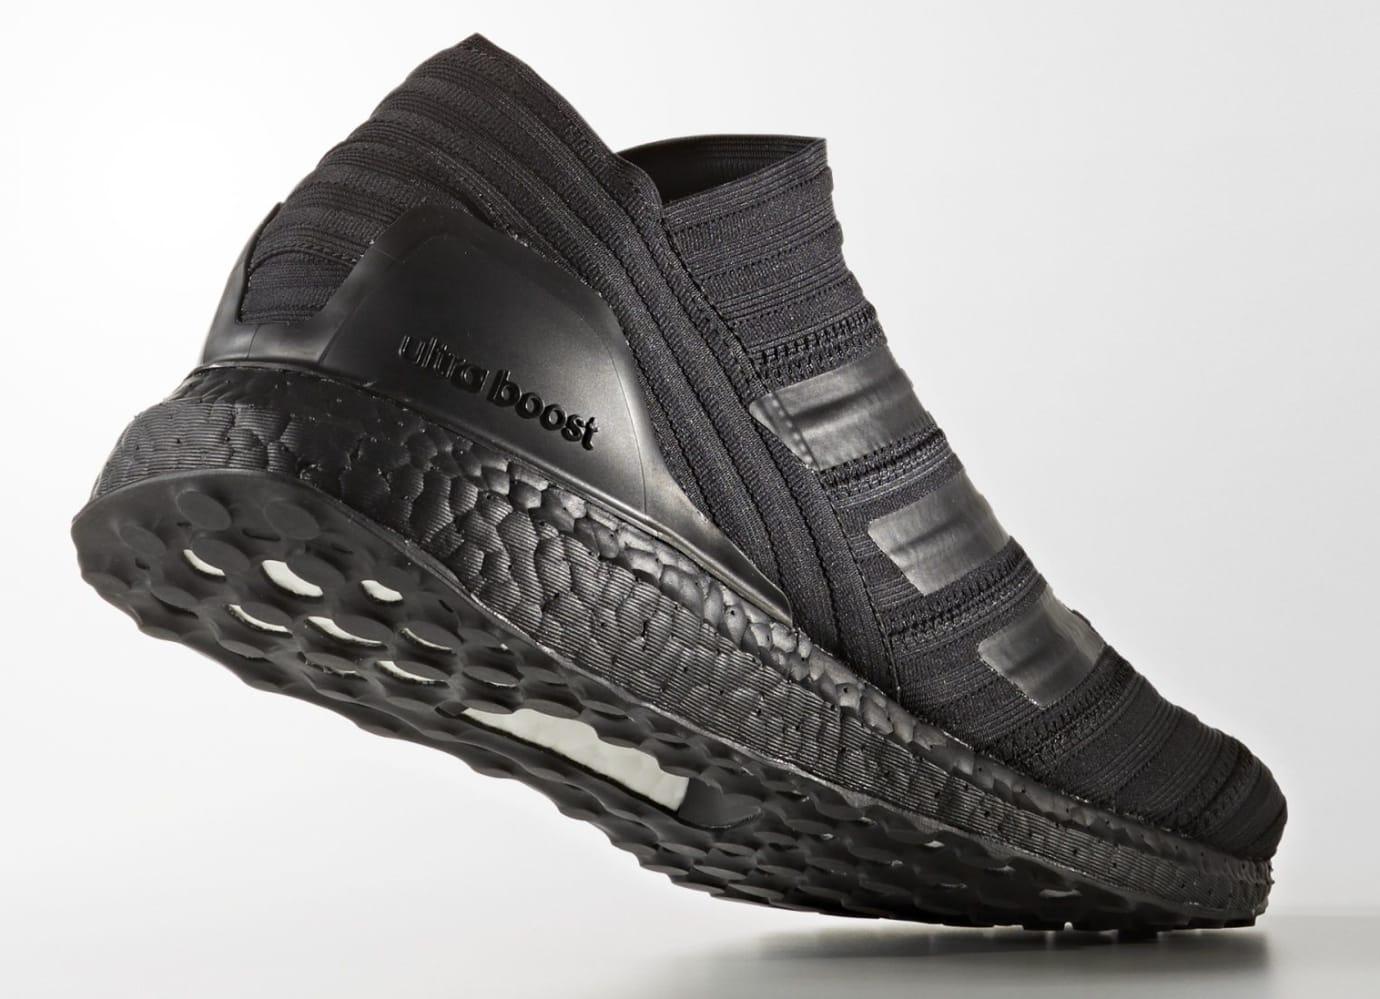 Adidas Nemeziz Tango 17+ 360 Agility 'Triple Black' CG3657 (Lateral)